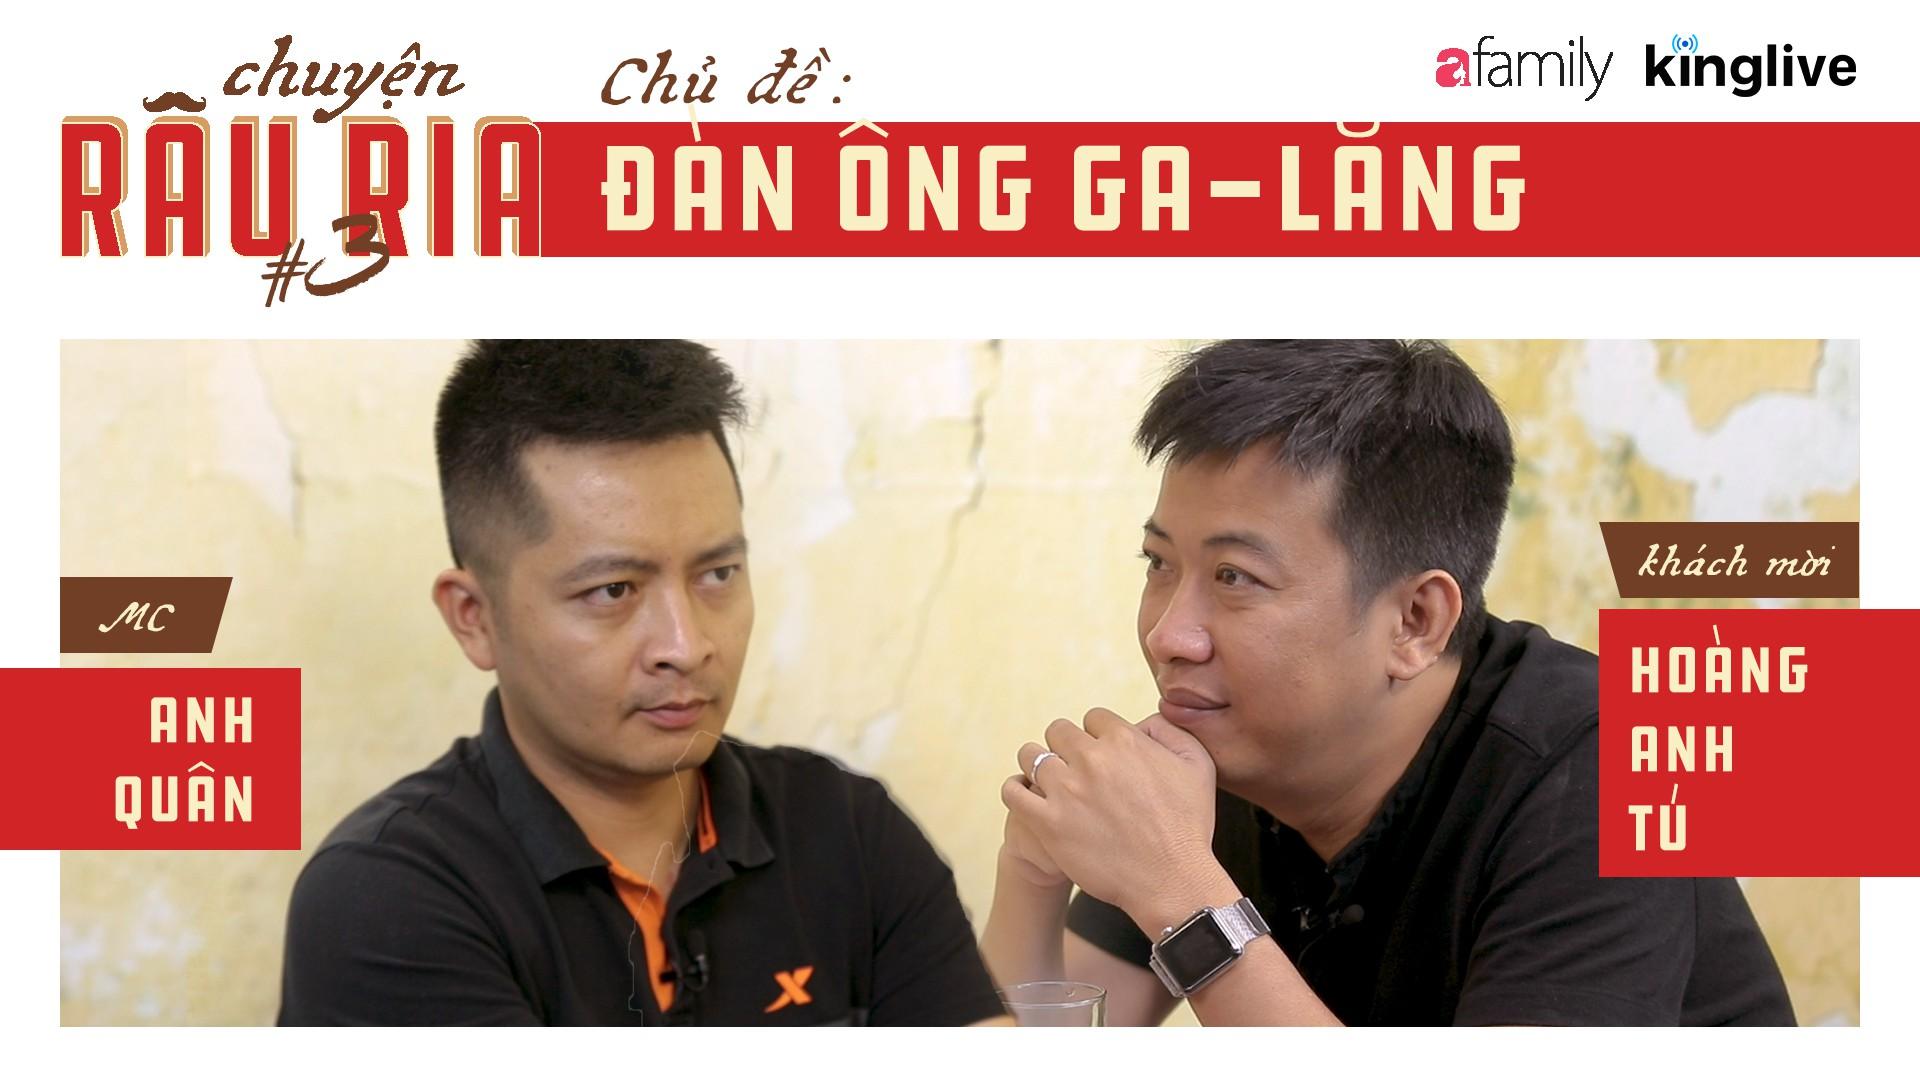 CRR3-HoangAnhTu-thumb